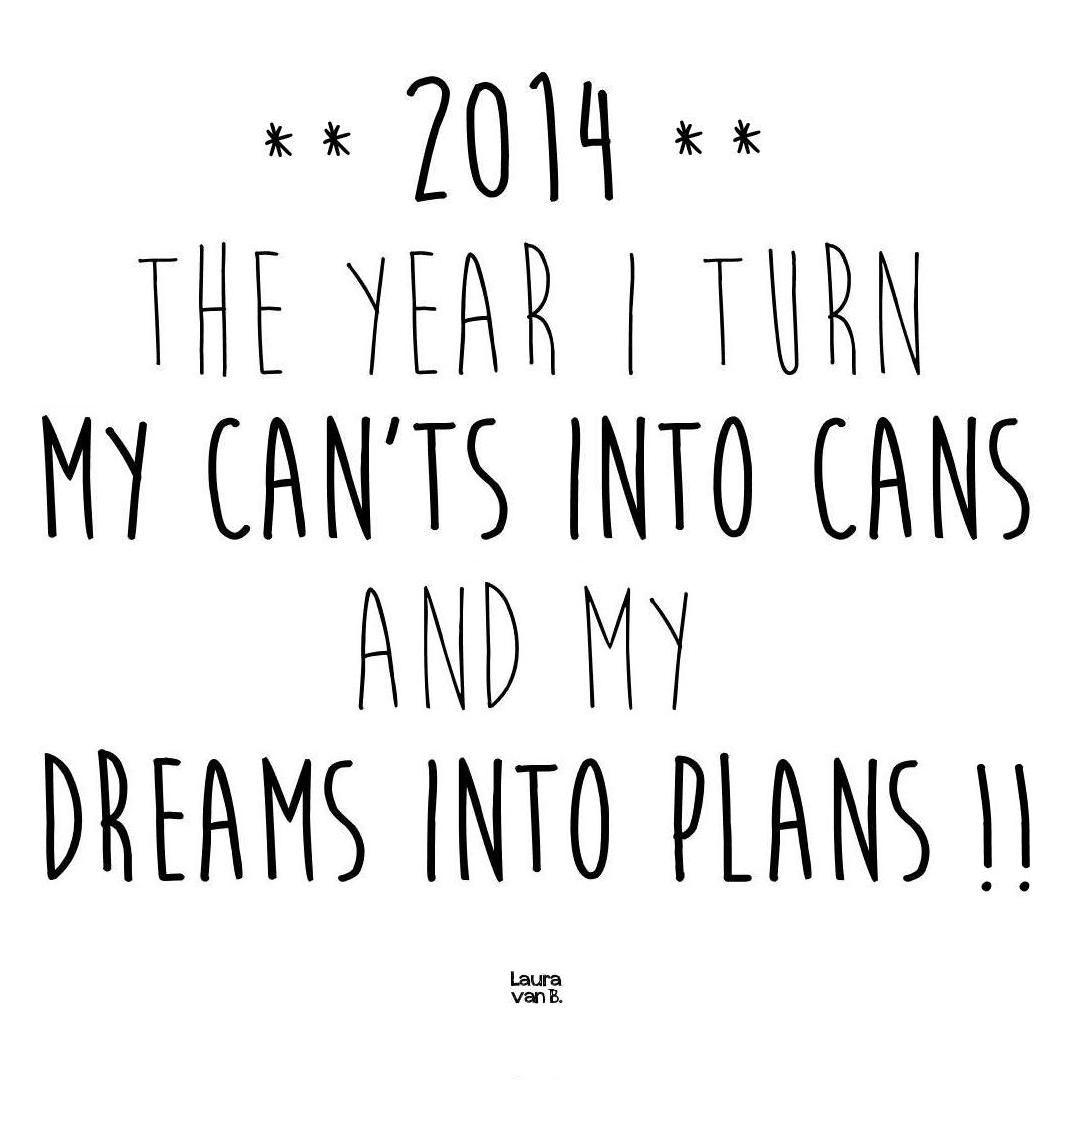 2014 YYYES